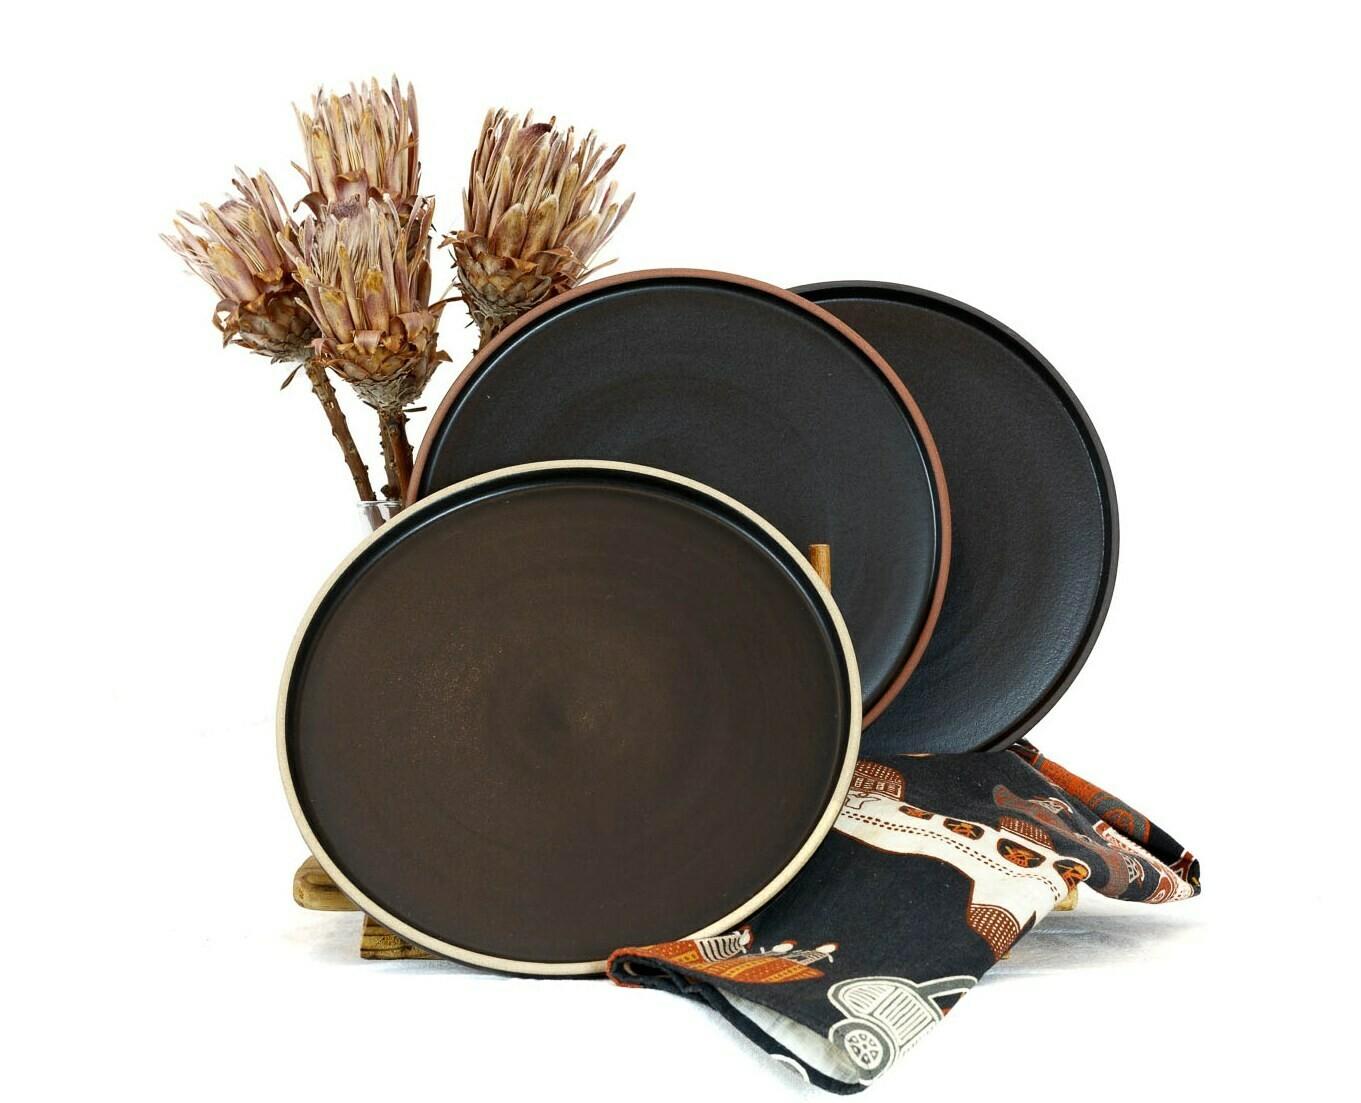 Crockery - Dinner Plate - Straight Edge